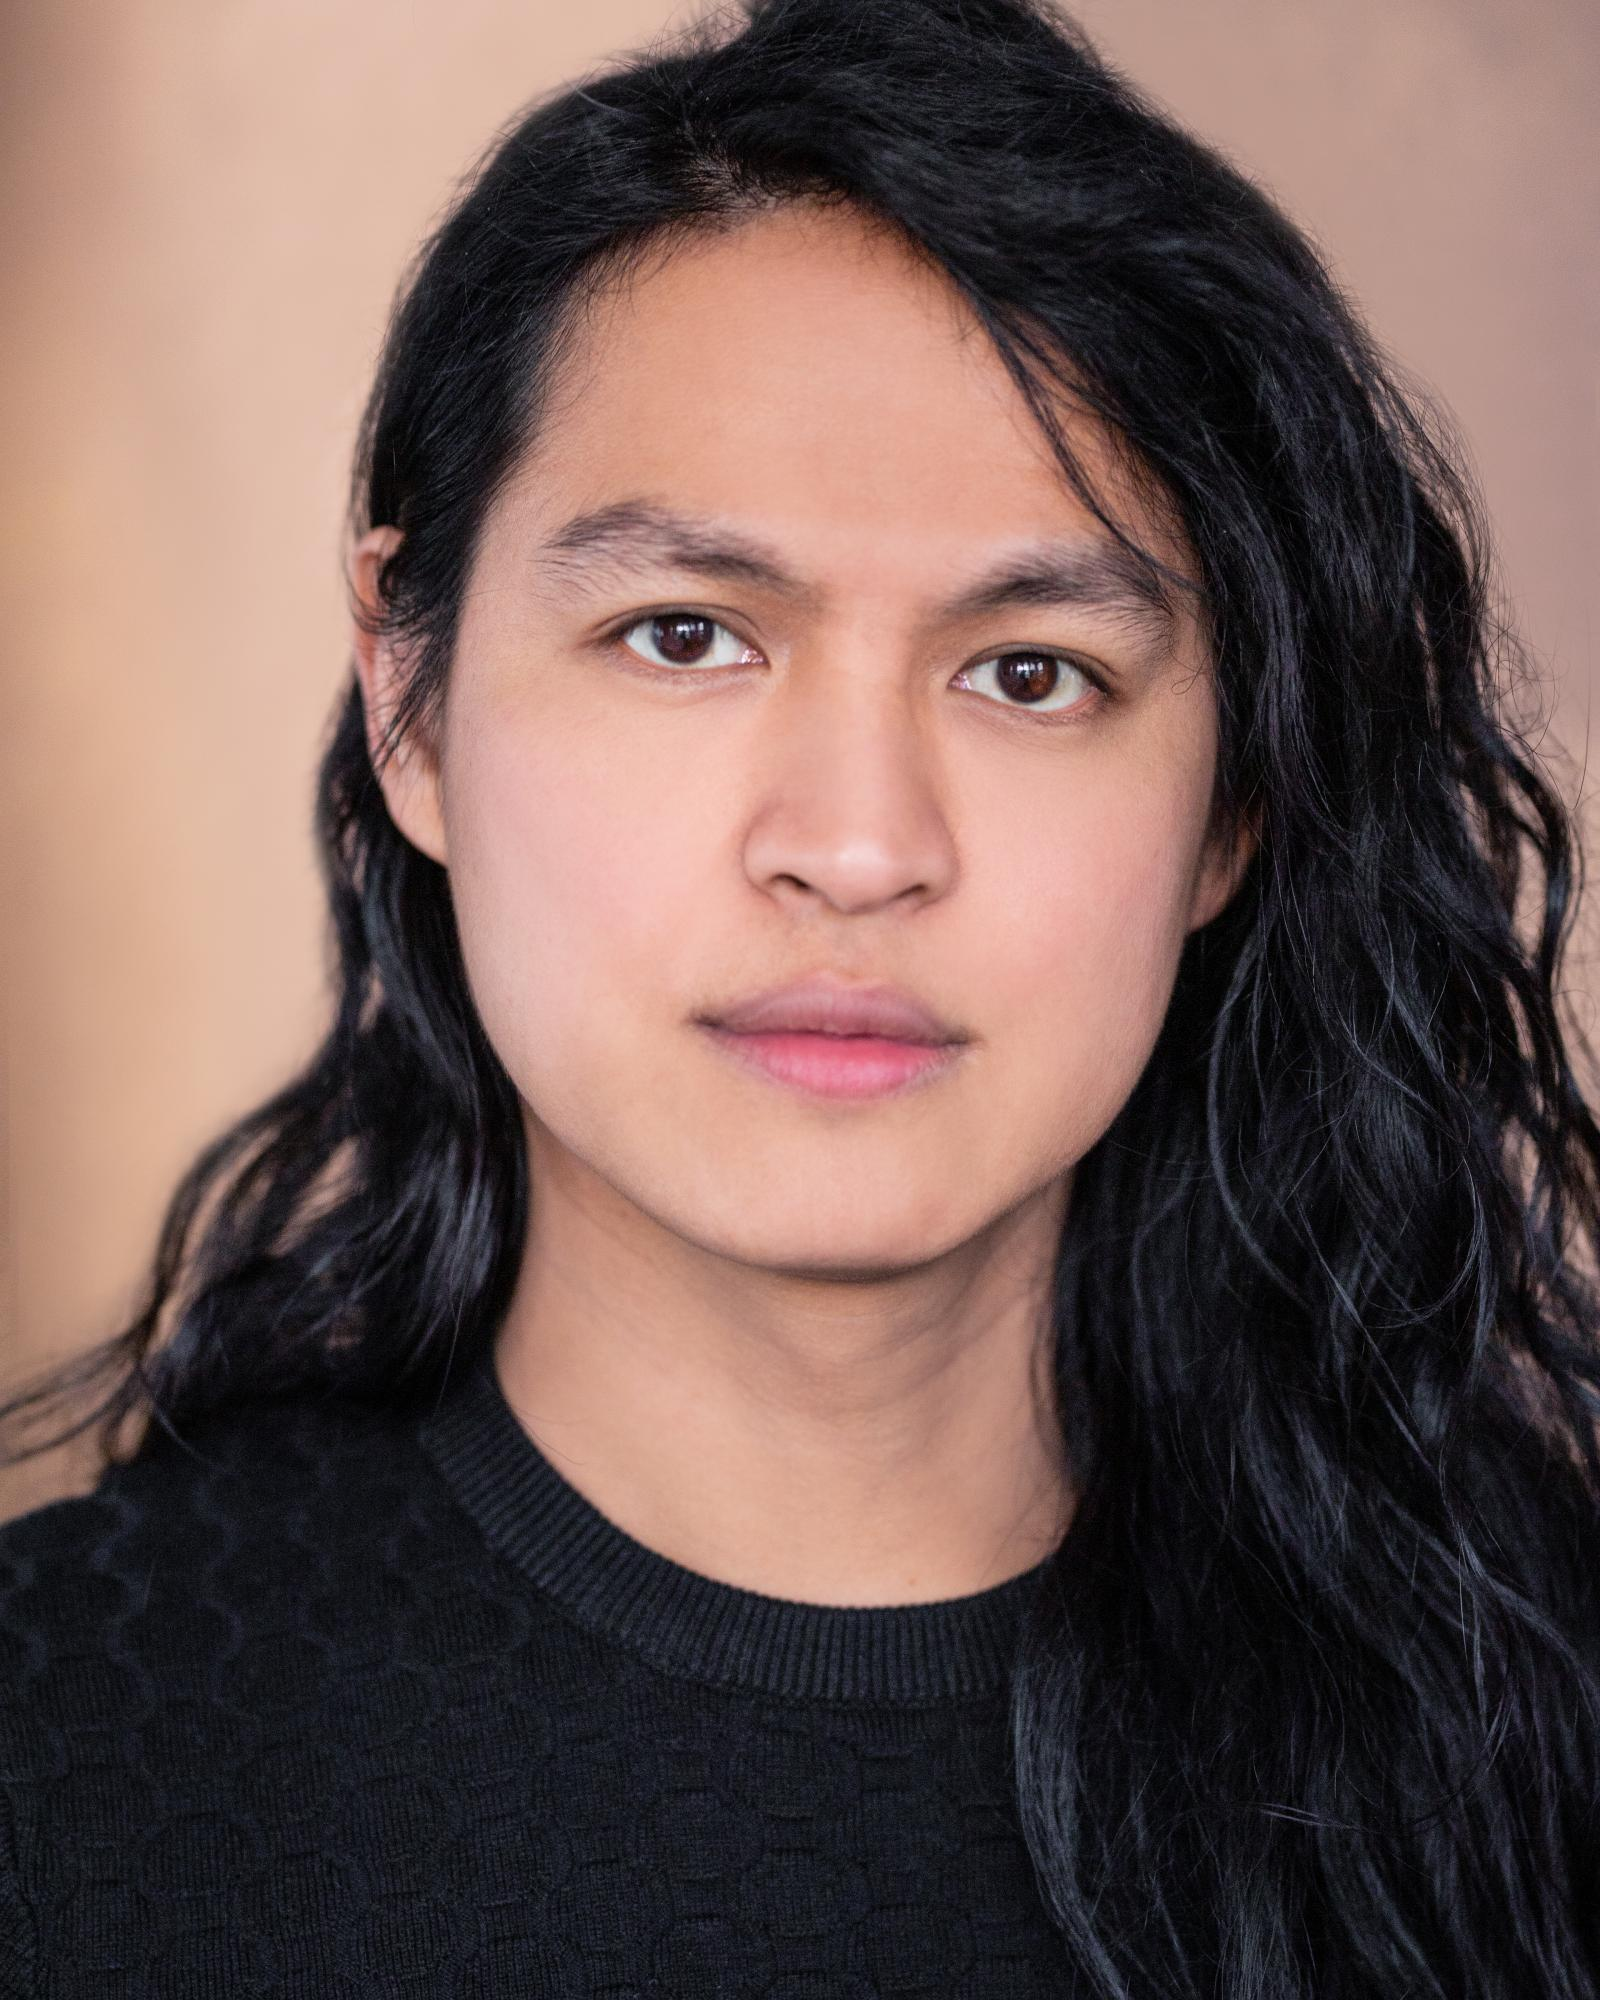 Ryan Ocampo